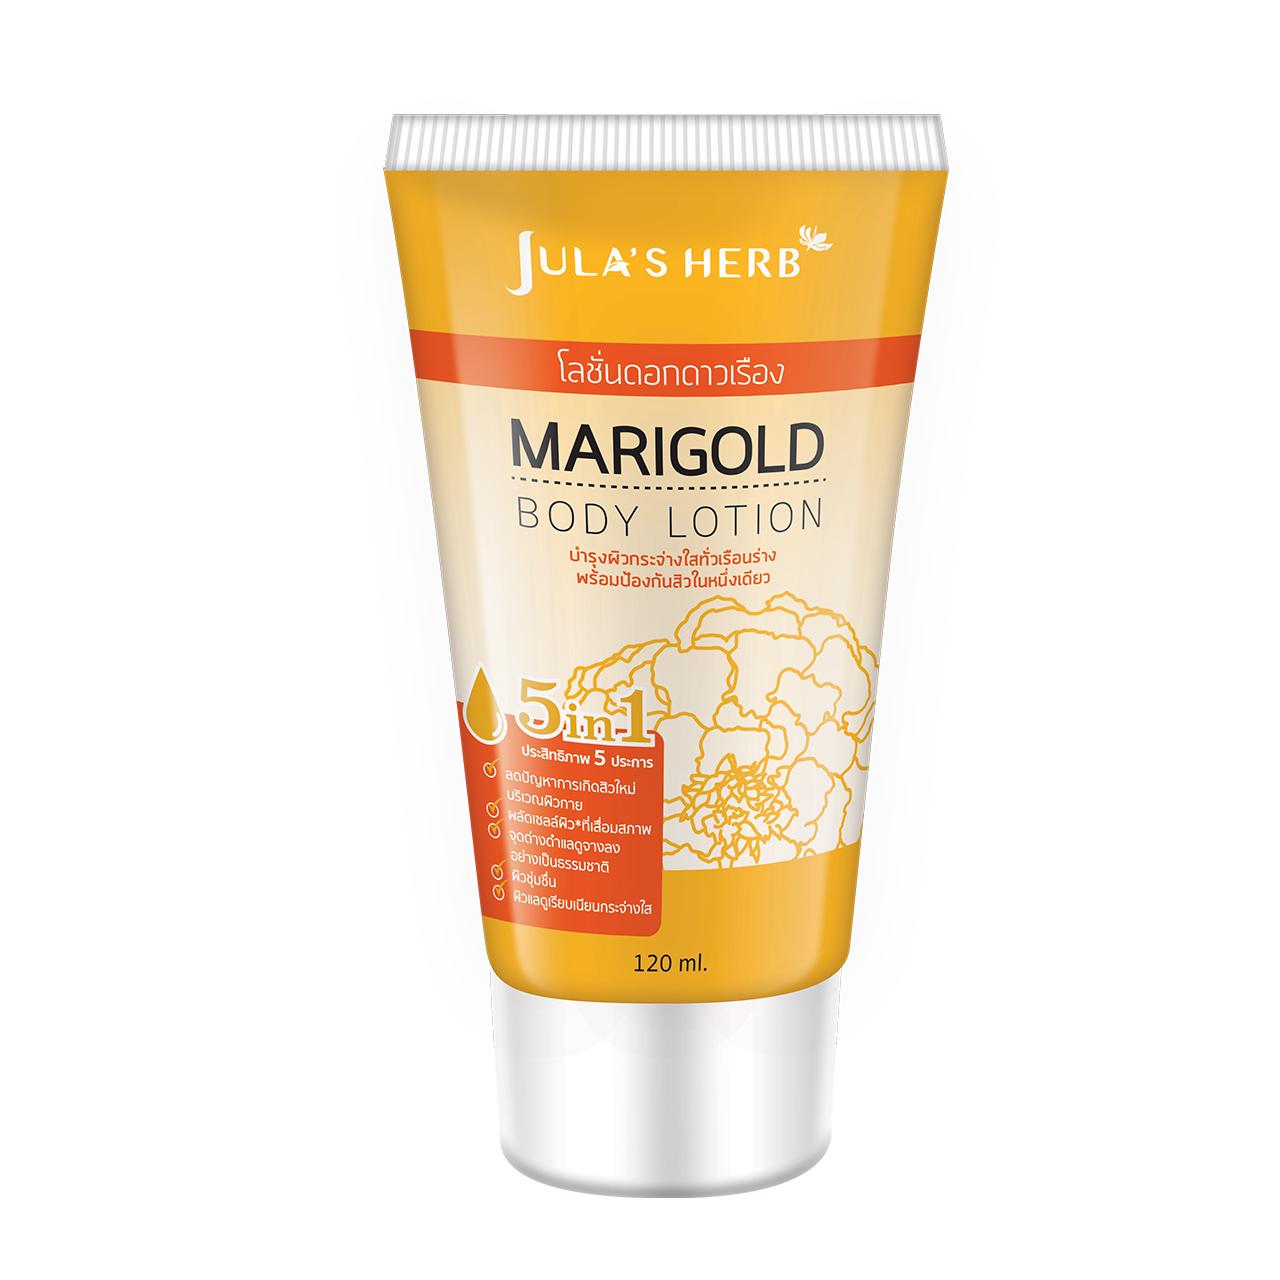 Marigold Body Lotion โลชั่นดอกดาวเรือง